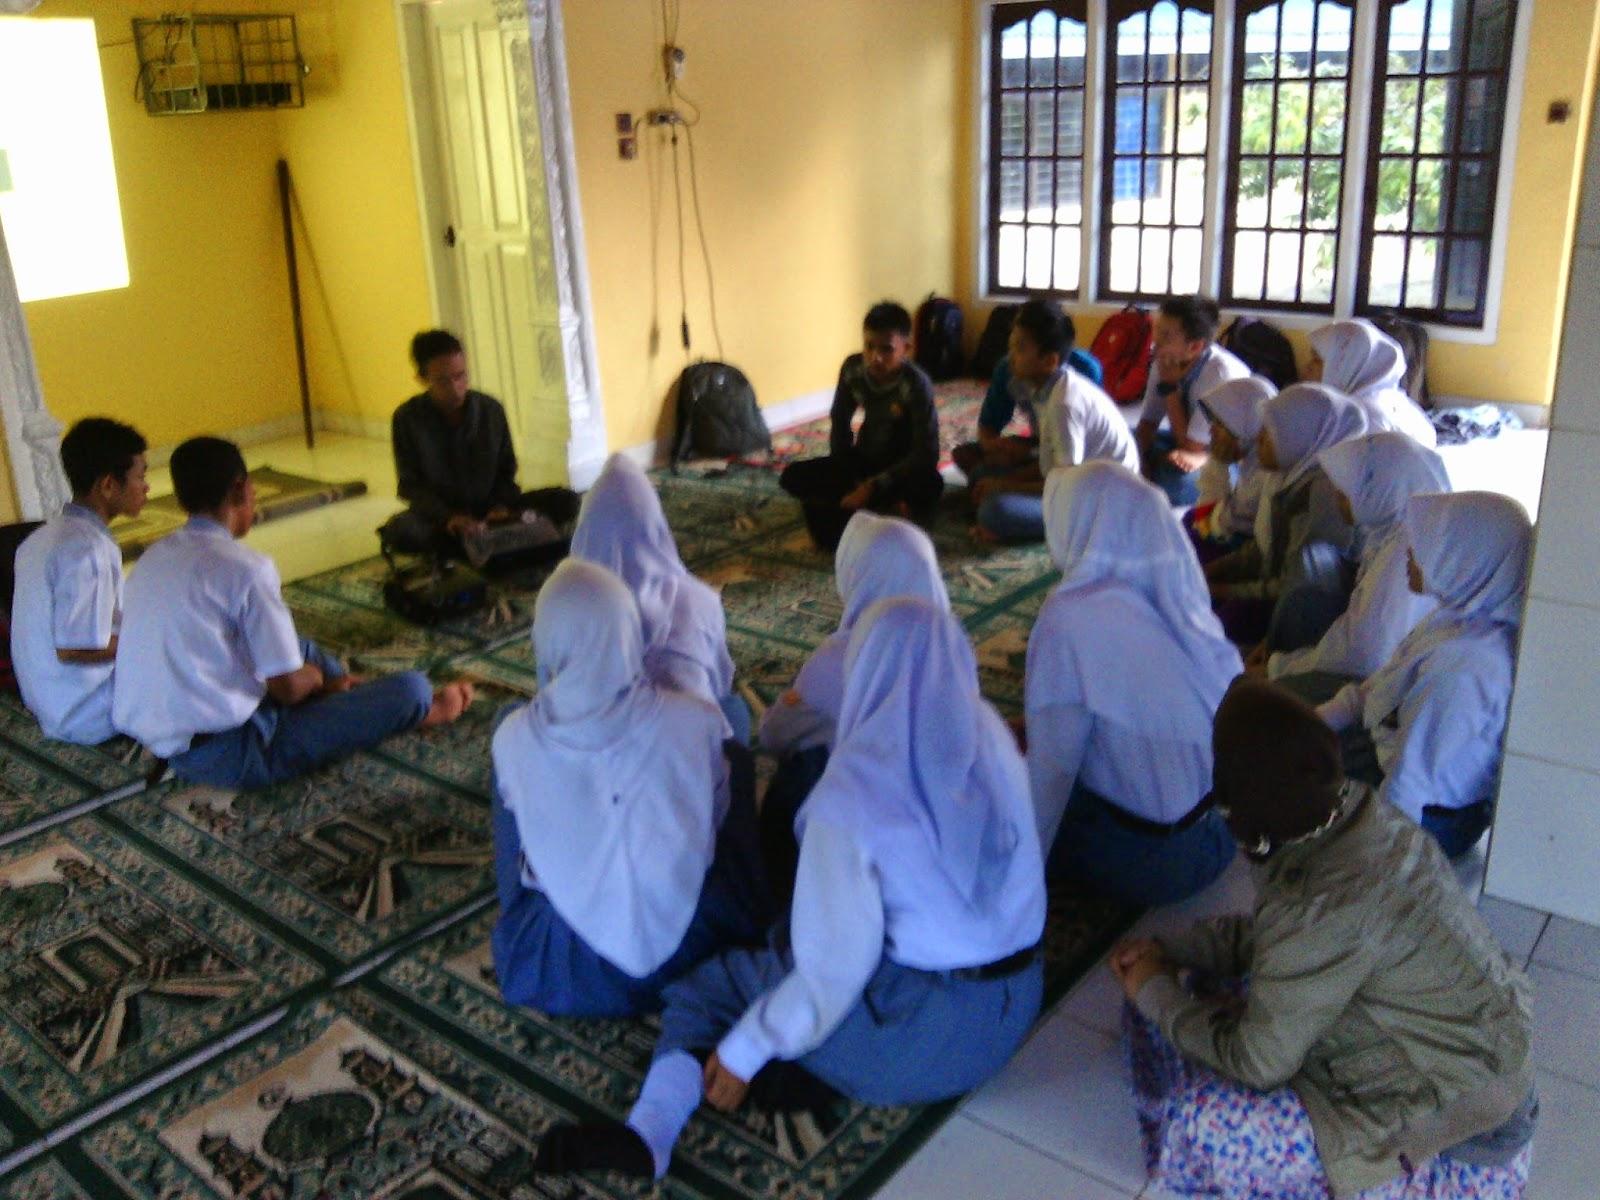 Rohani Islam Sman 9 Kota Jambi Kegiatan Mentoring Di Sma Negeri 9 Kota Jambi